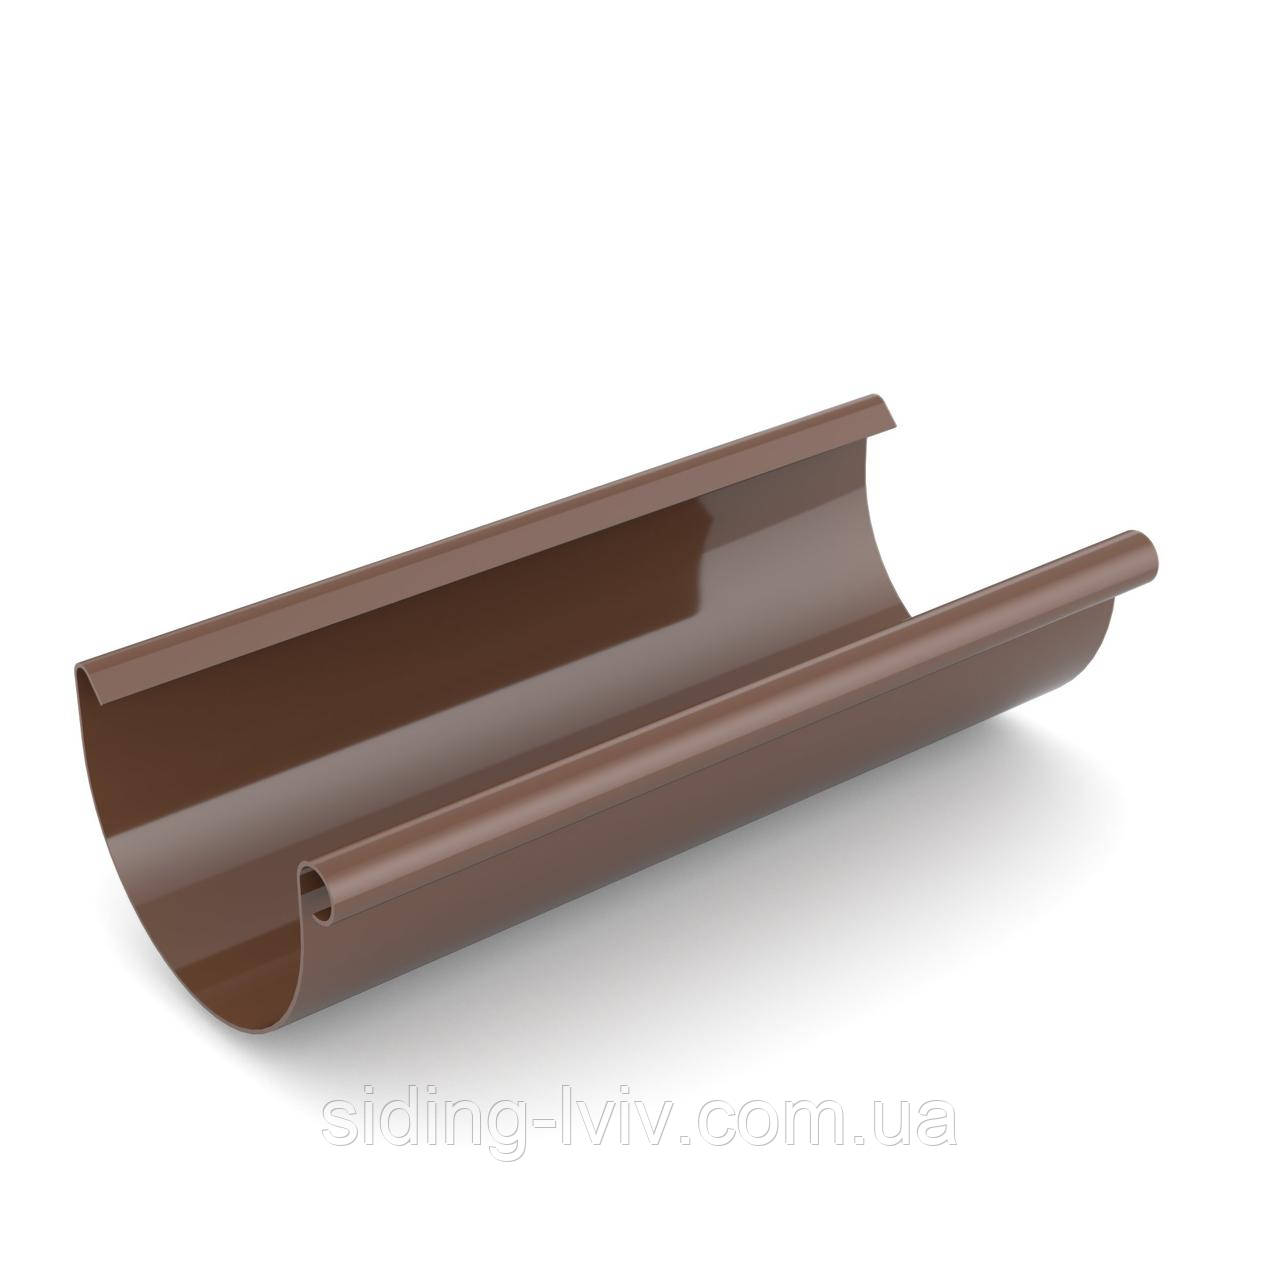 Ринва Bryza 125 мм коричнева